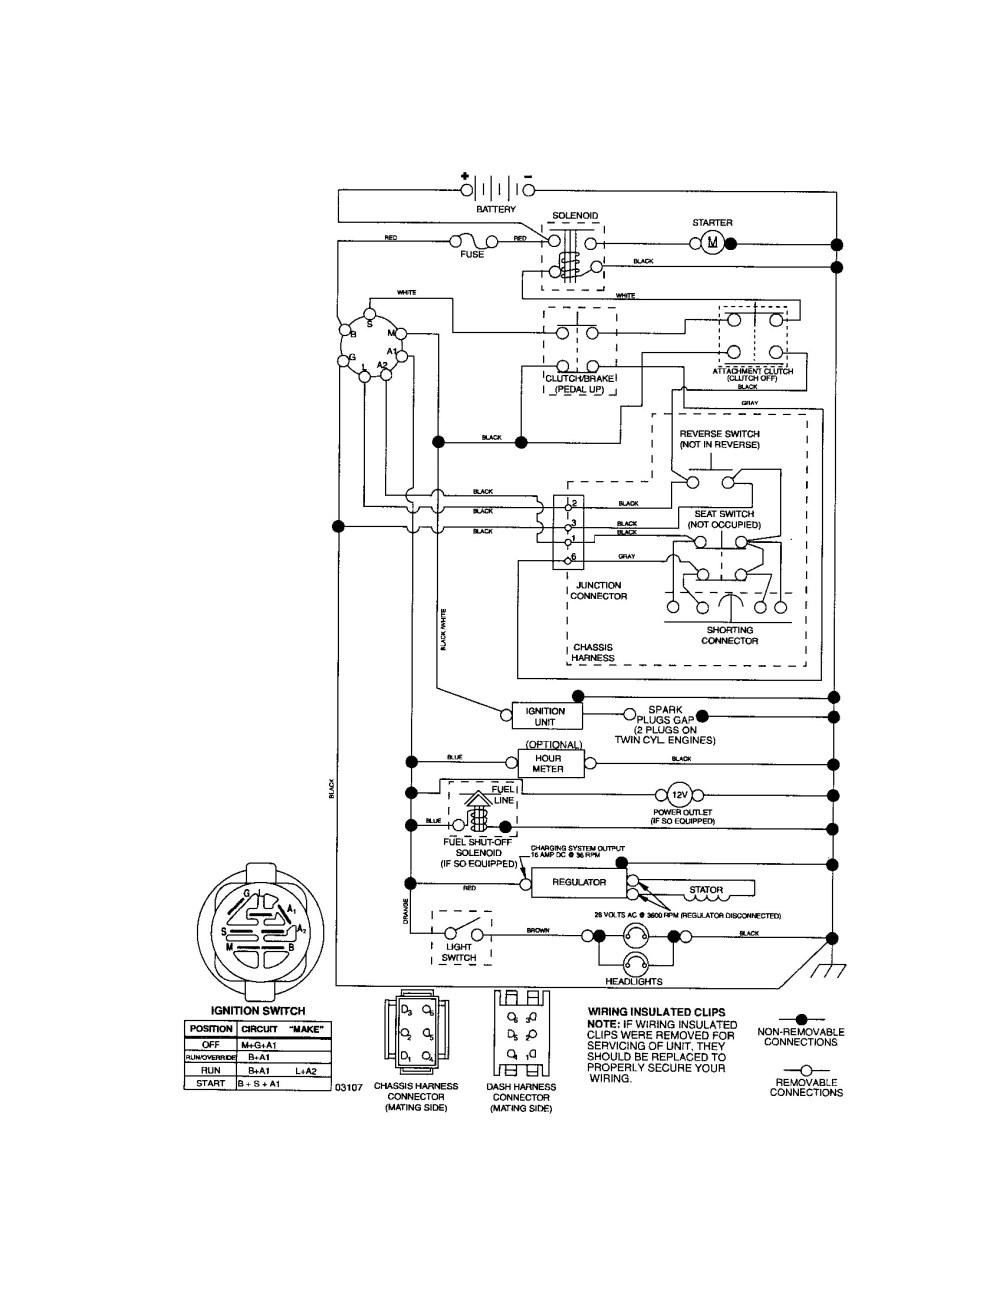 medium resolution of john deere l130 engine diagram craftsman riding mower electrical diagram of john deere l130 engine diagram